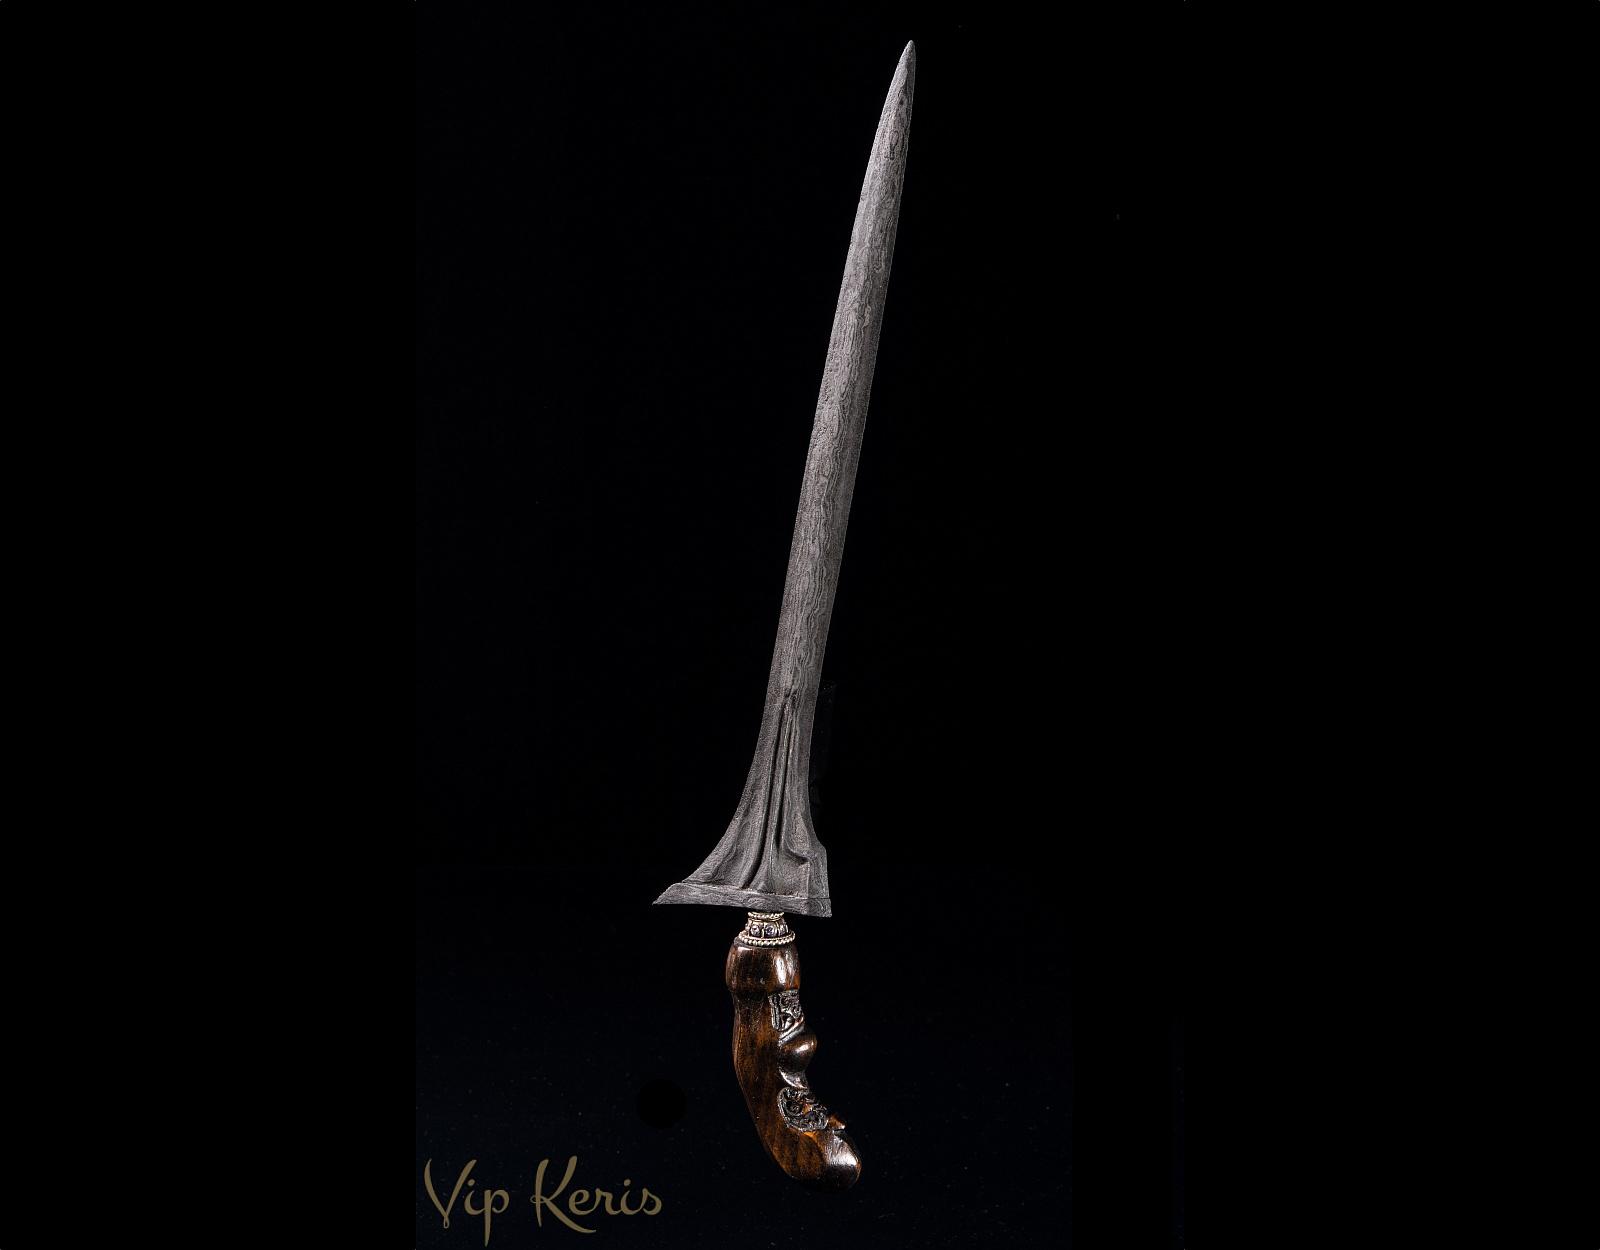 Нож Крис Jalak Sangu Tumpeng, 3 аркан фото VipKeris